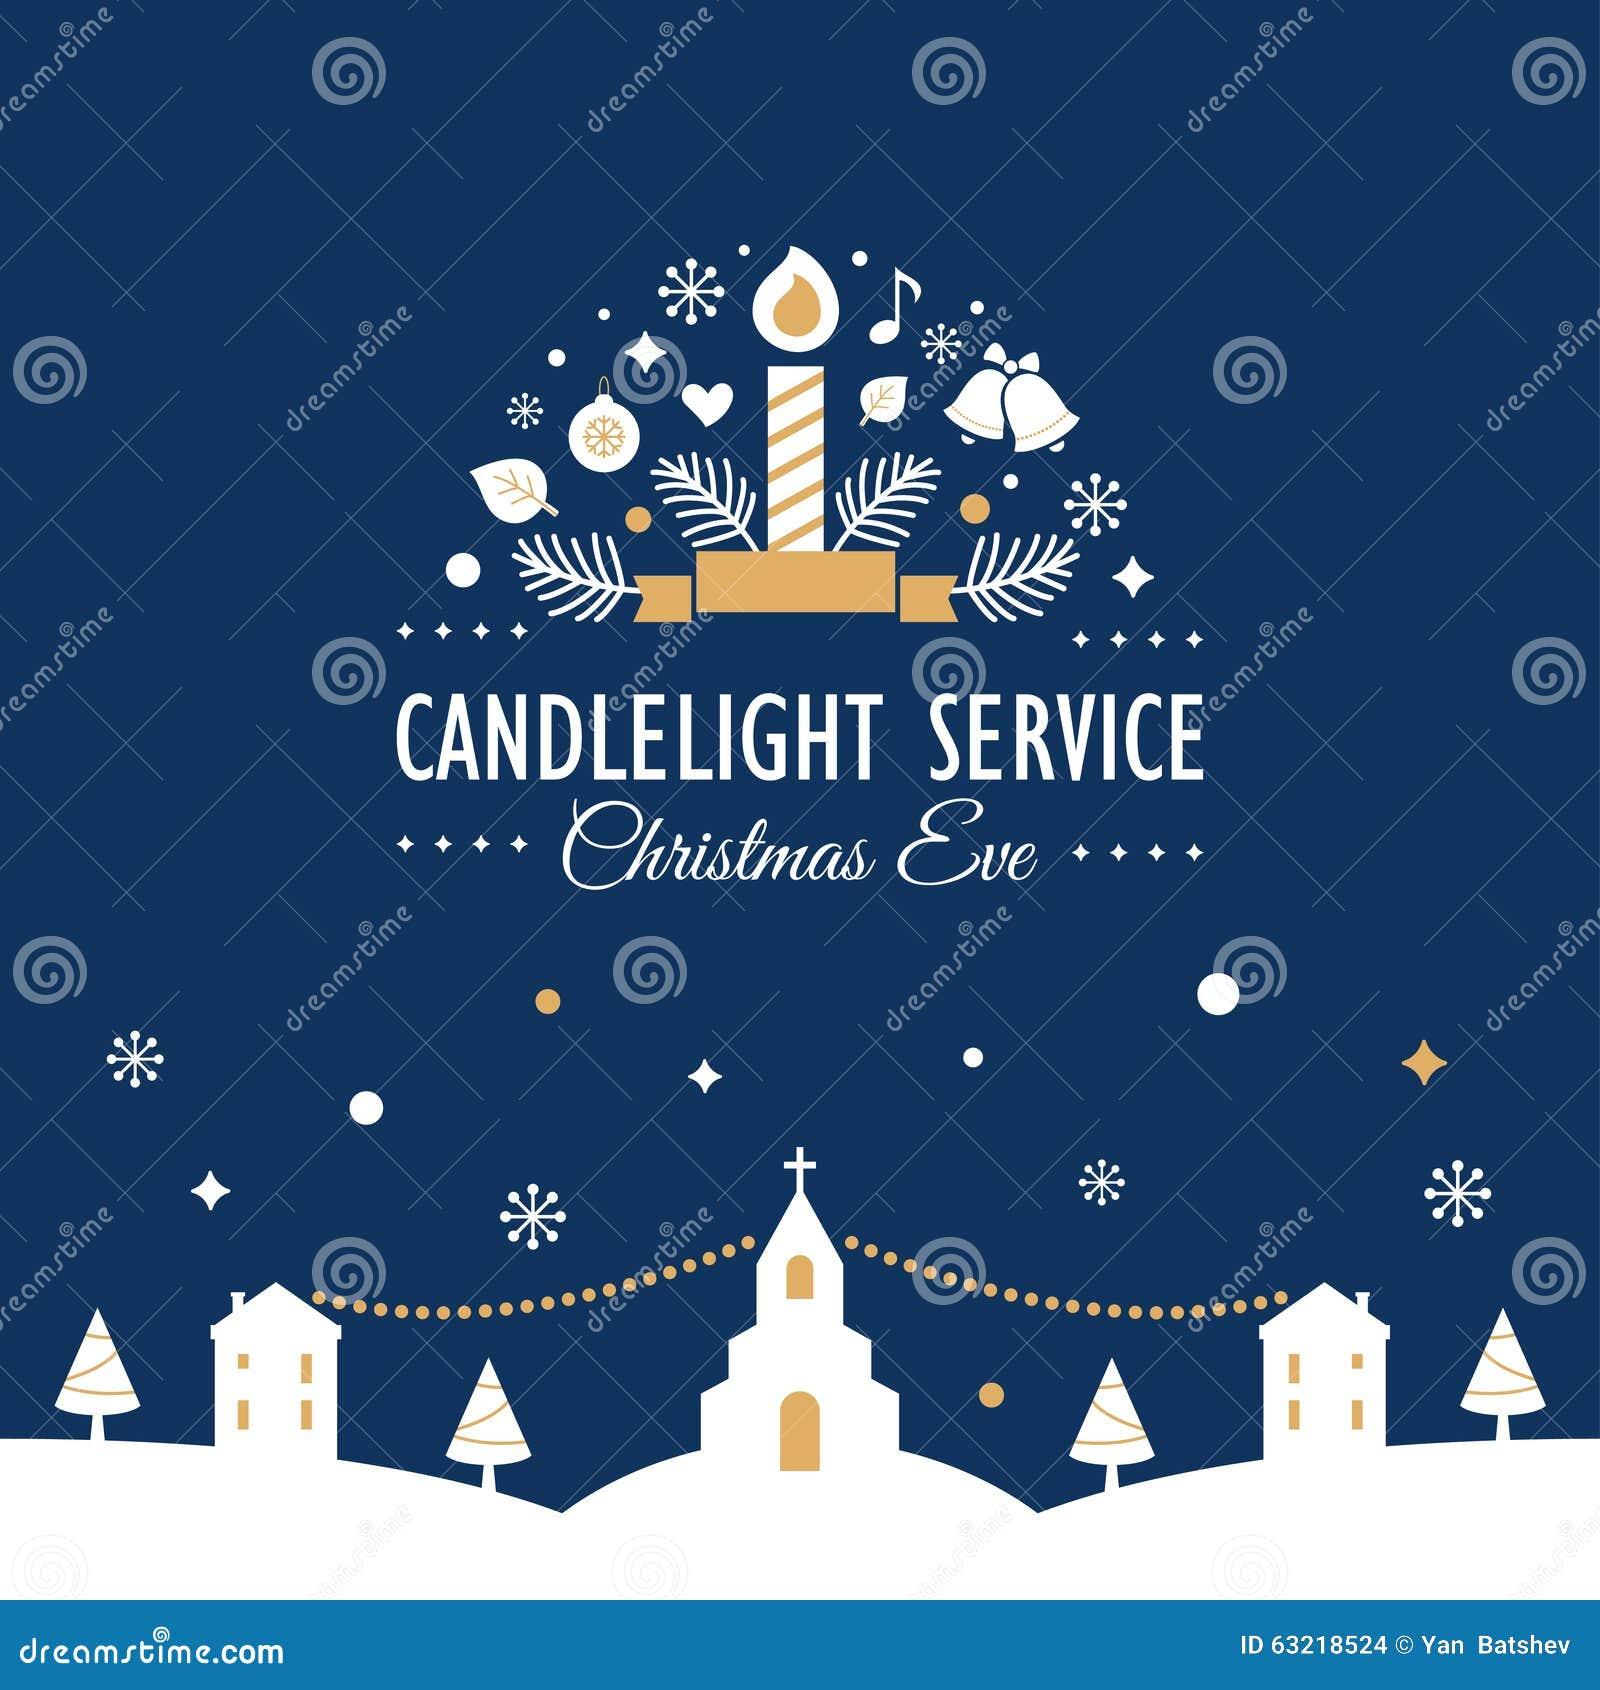 Christmas Eve Candlelight Service Invitation Card Stock Vector ...